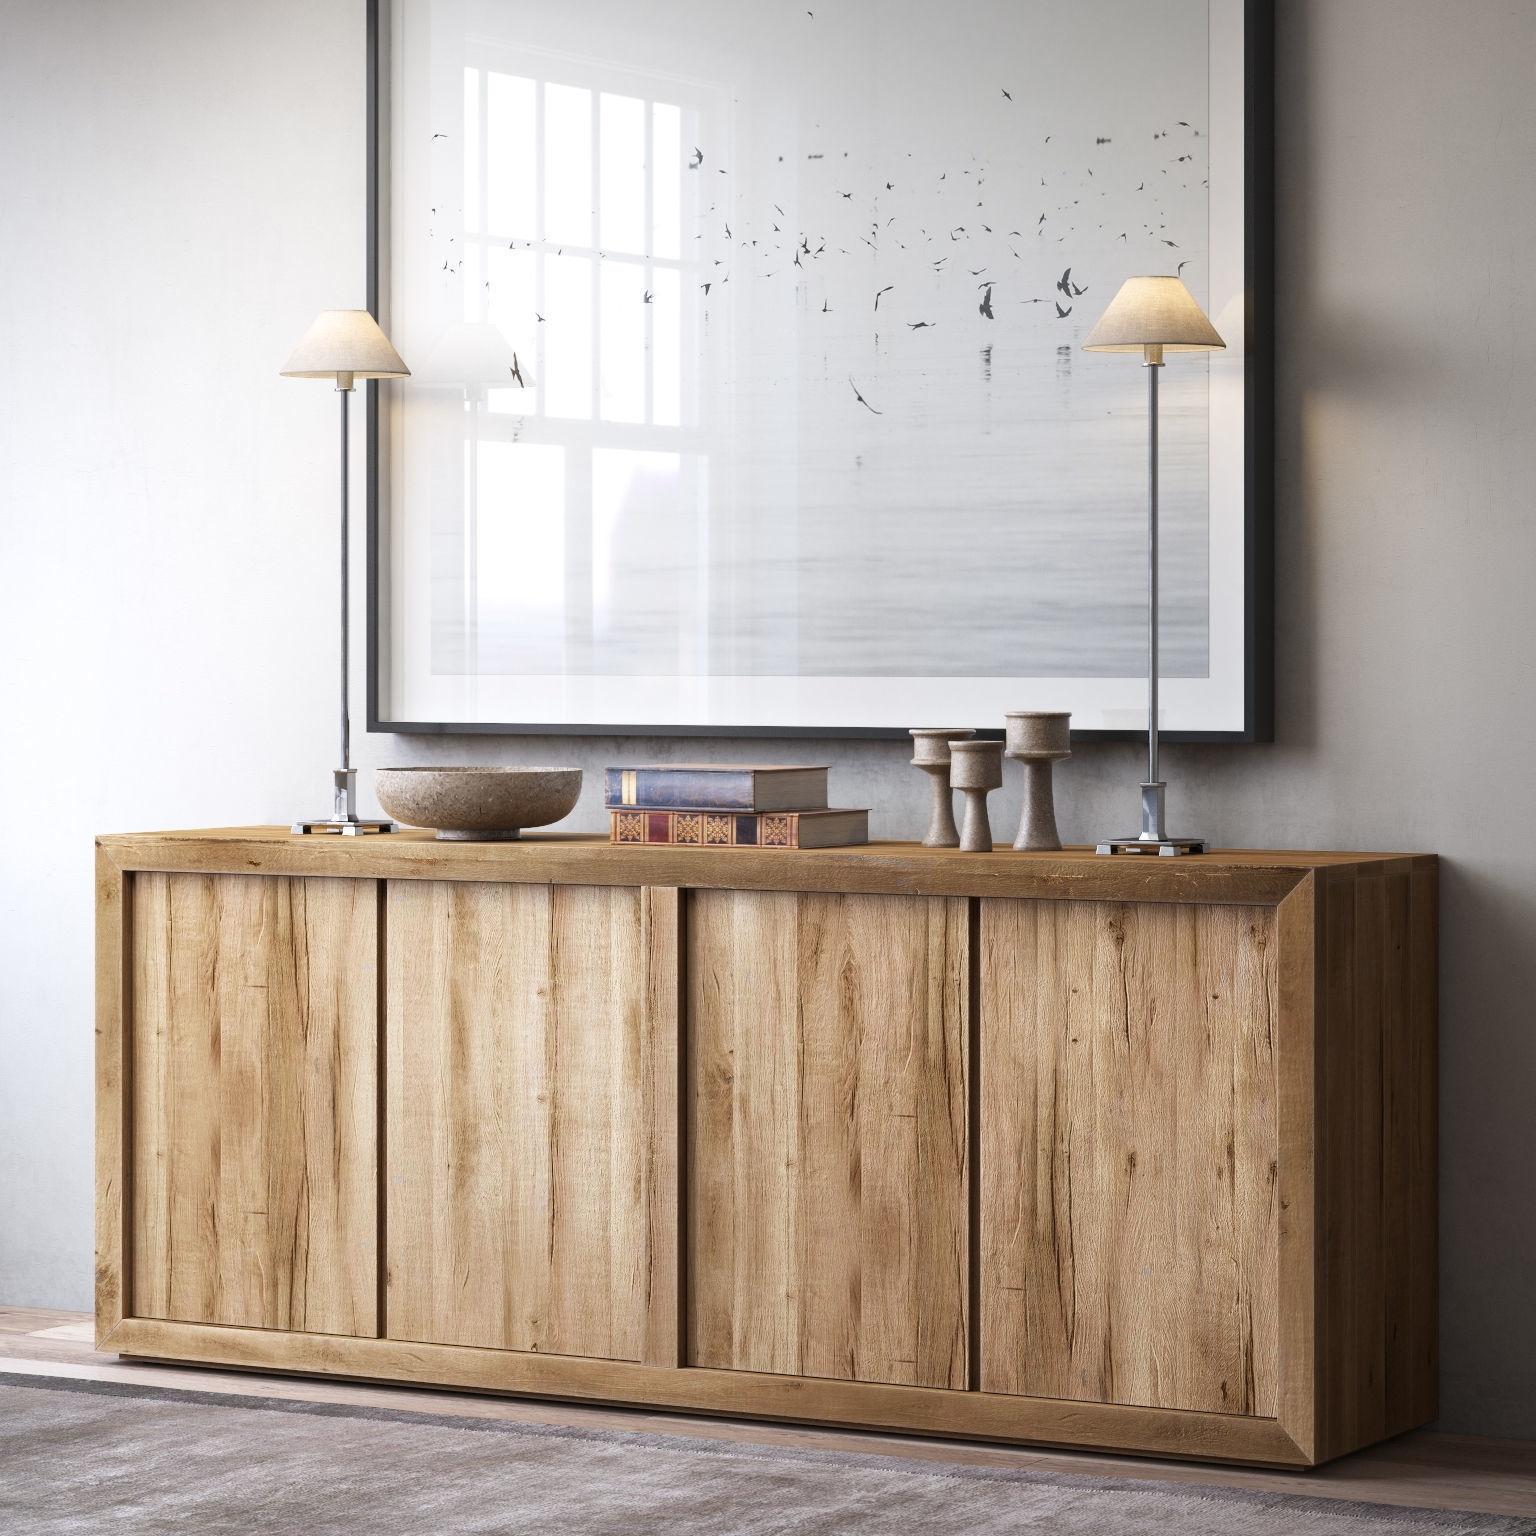 Reclaimed Russian Oak Panel 4 Door Wood Sideboard 3D Model Max Obj Within 2017 Reclaimed Sideboards With Metal Panel (#9 of 20)